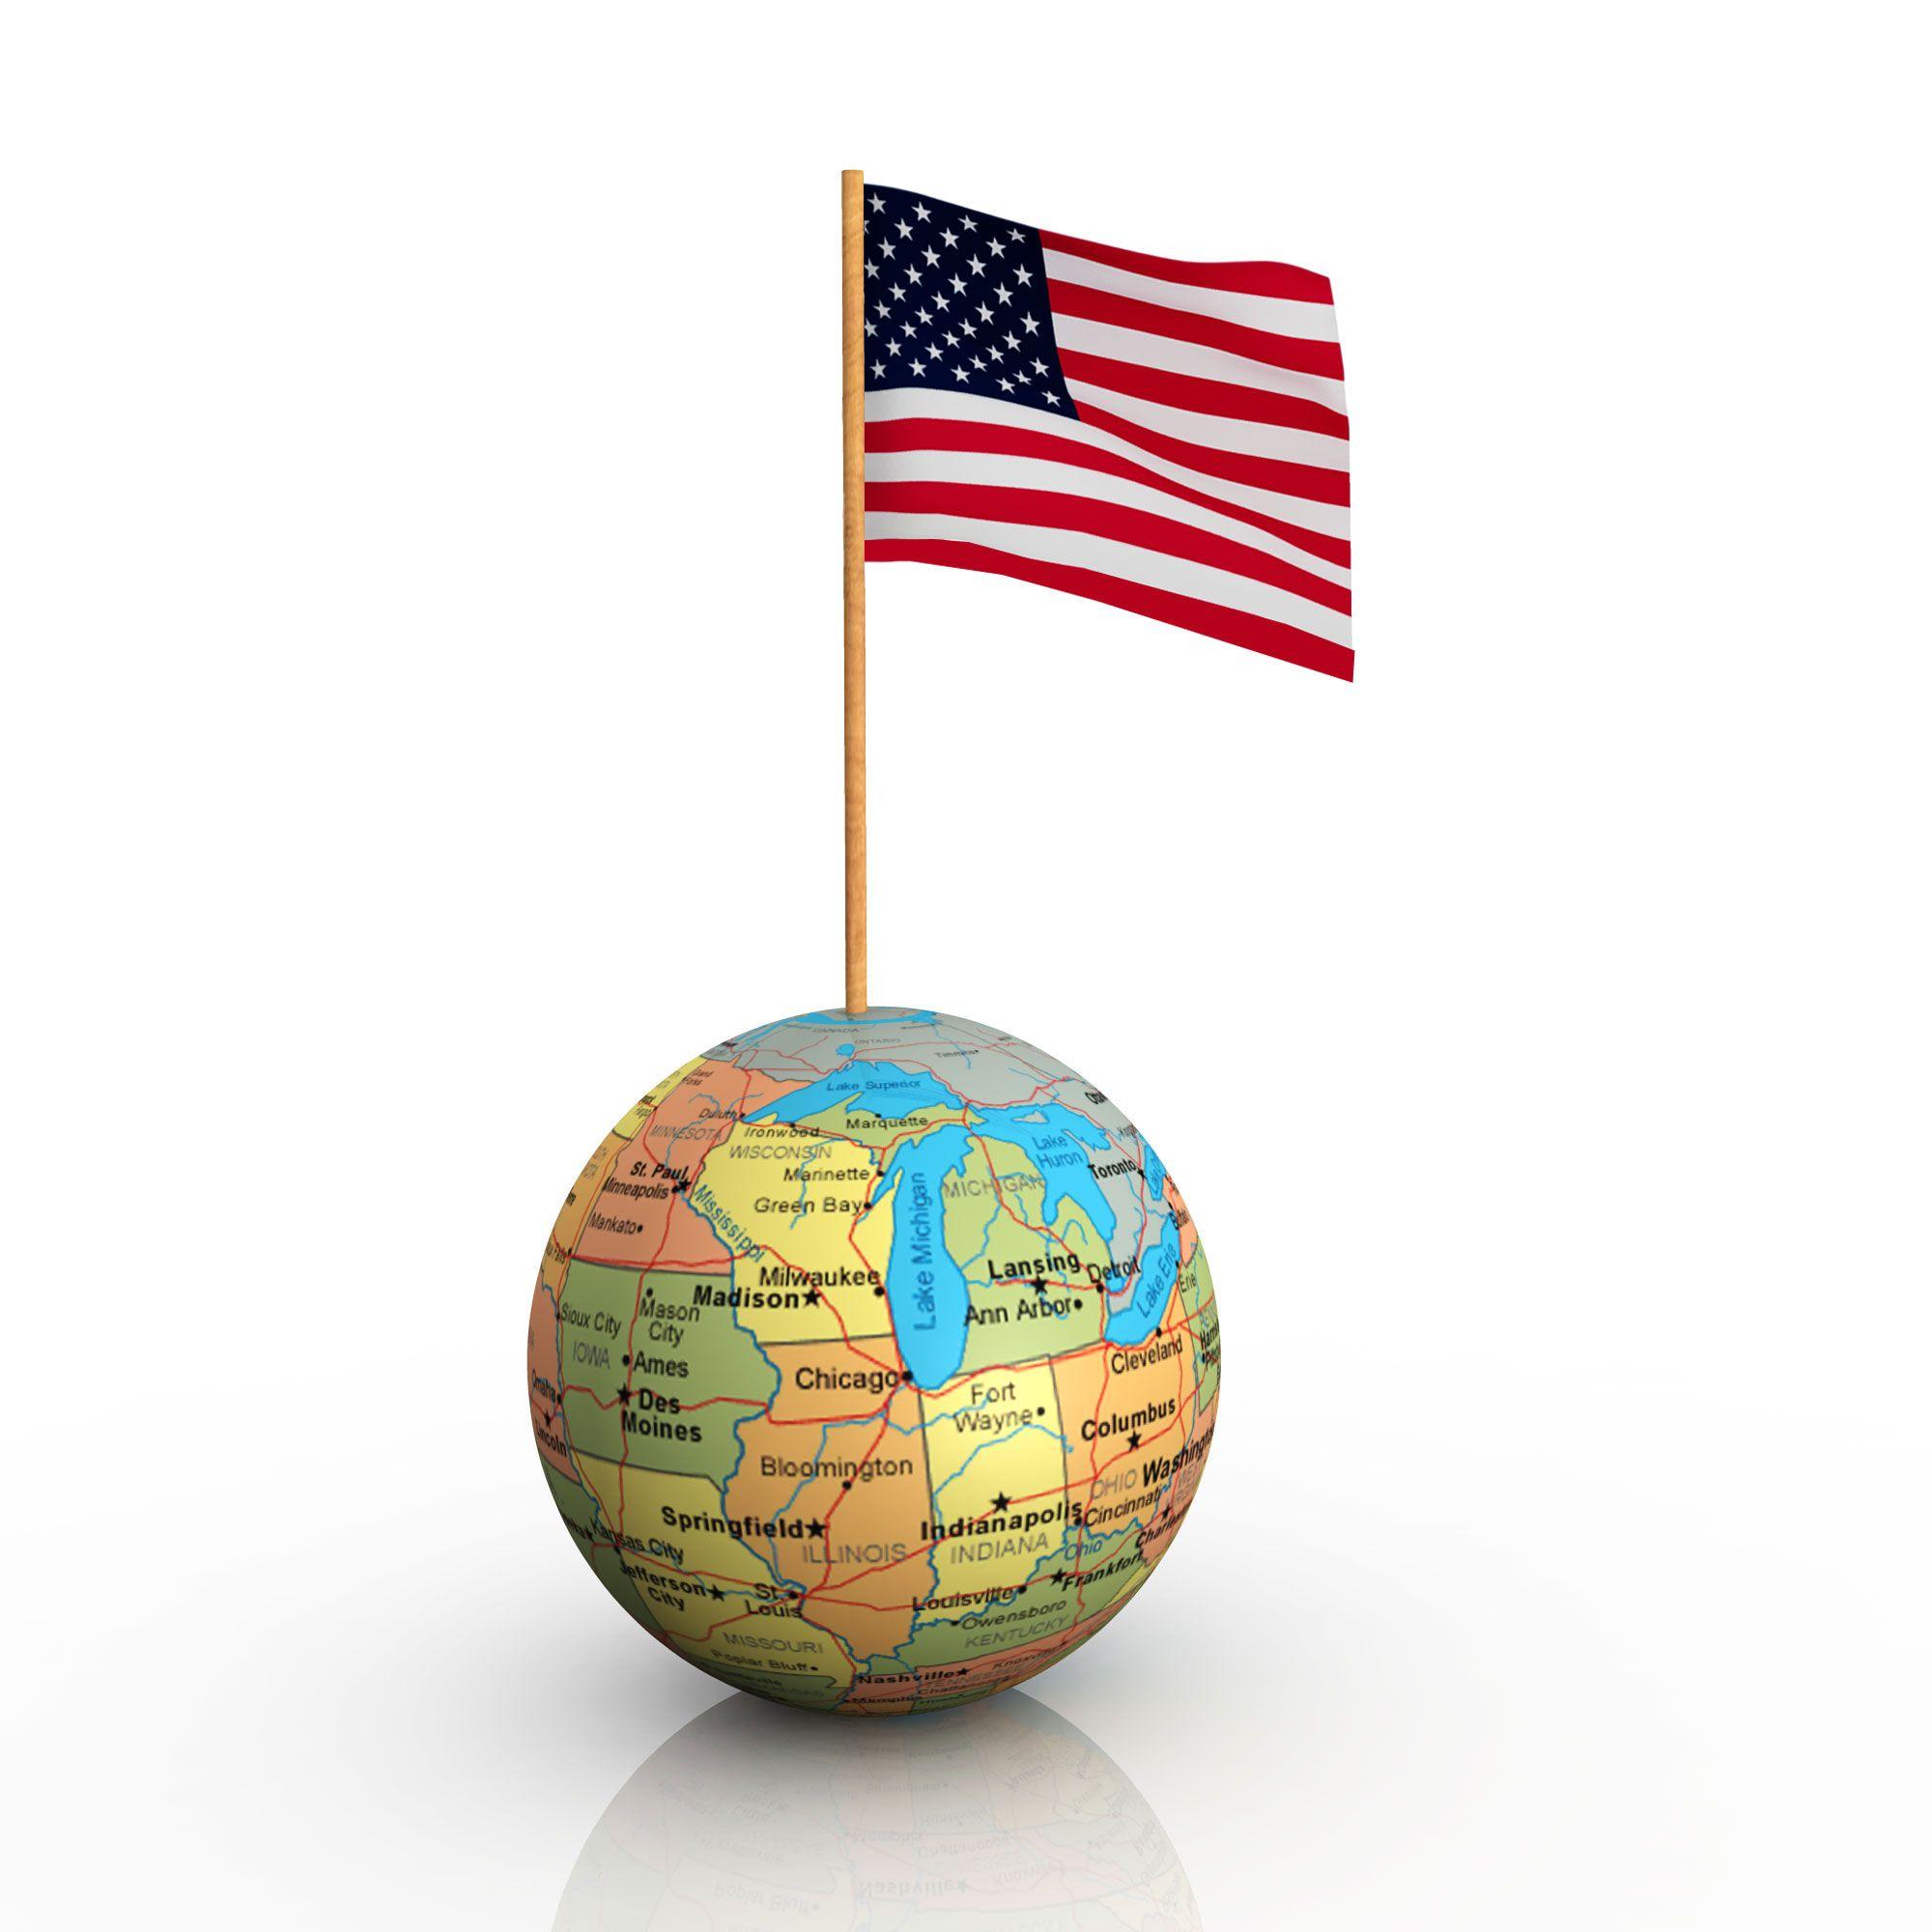 flag_of_usa_over_the_globe_stock_photo_Slide01